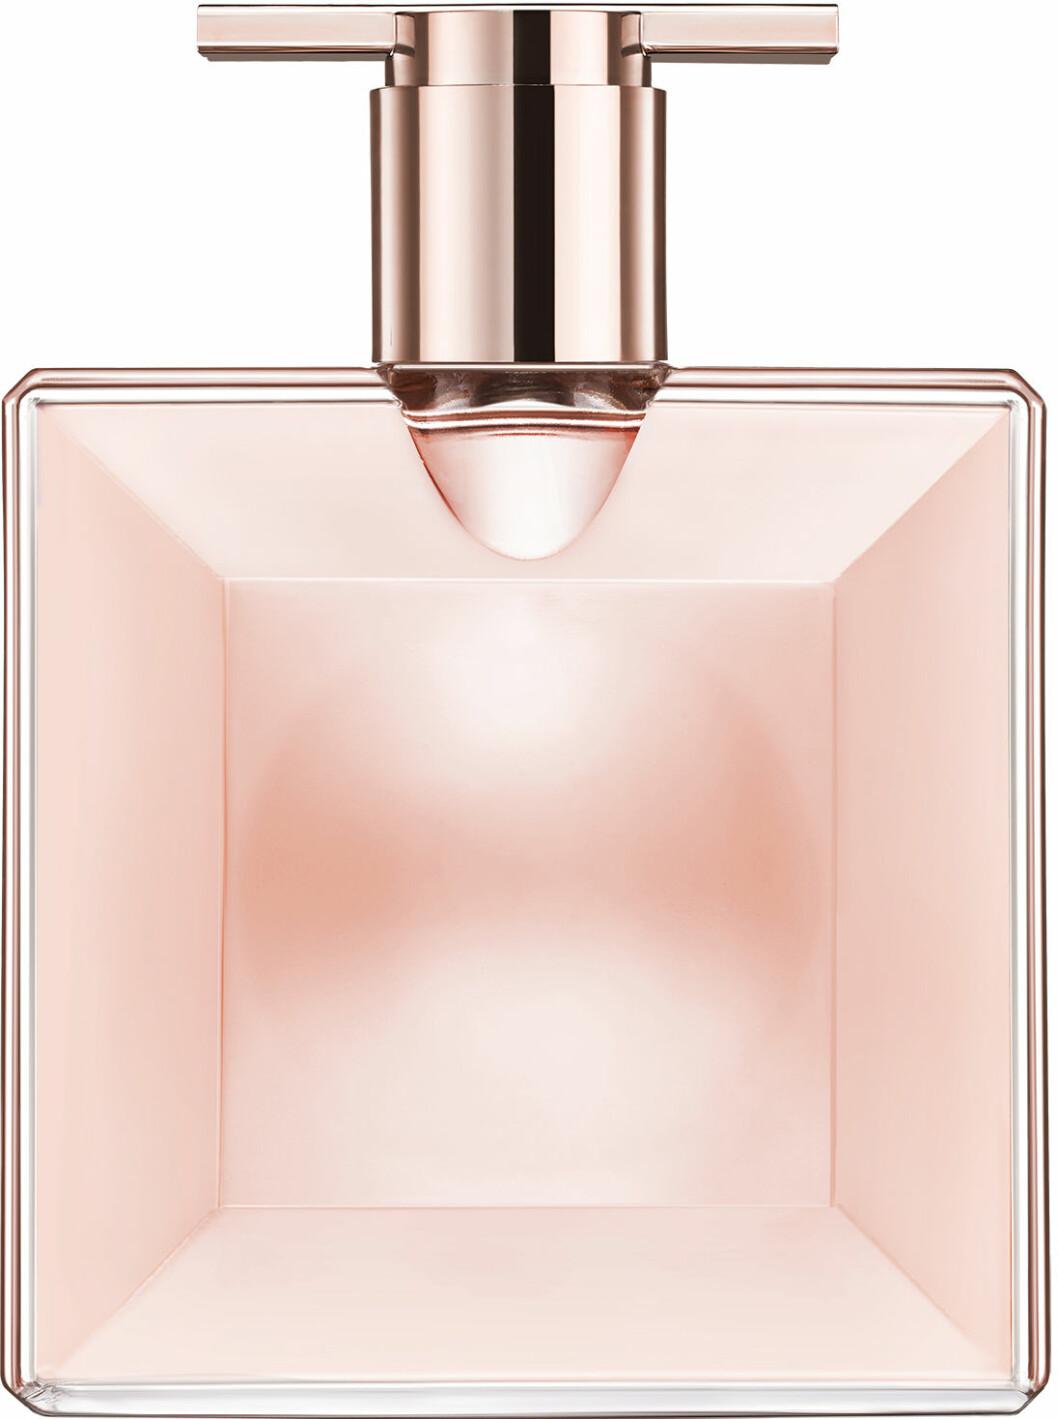 Lancômes senaste parfym Idôle